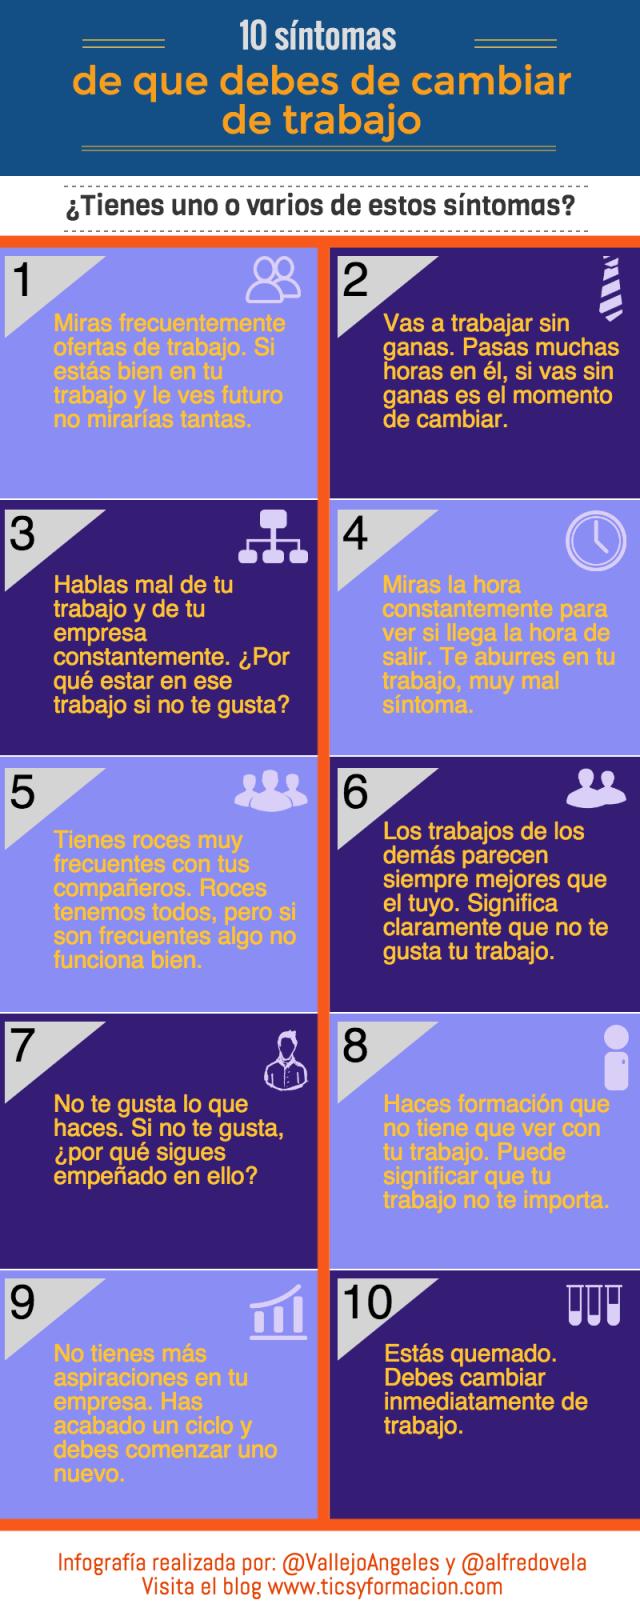 infografia-10-sintomas-de-que-debes-cambiar-de-trabajo